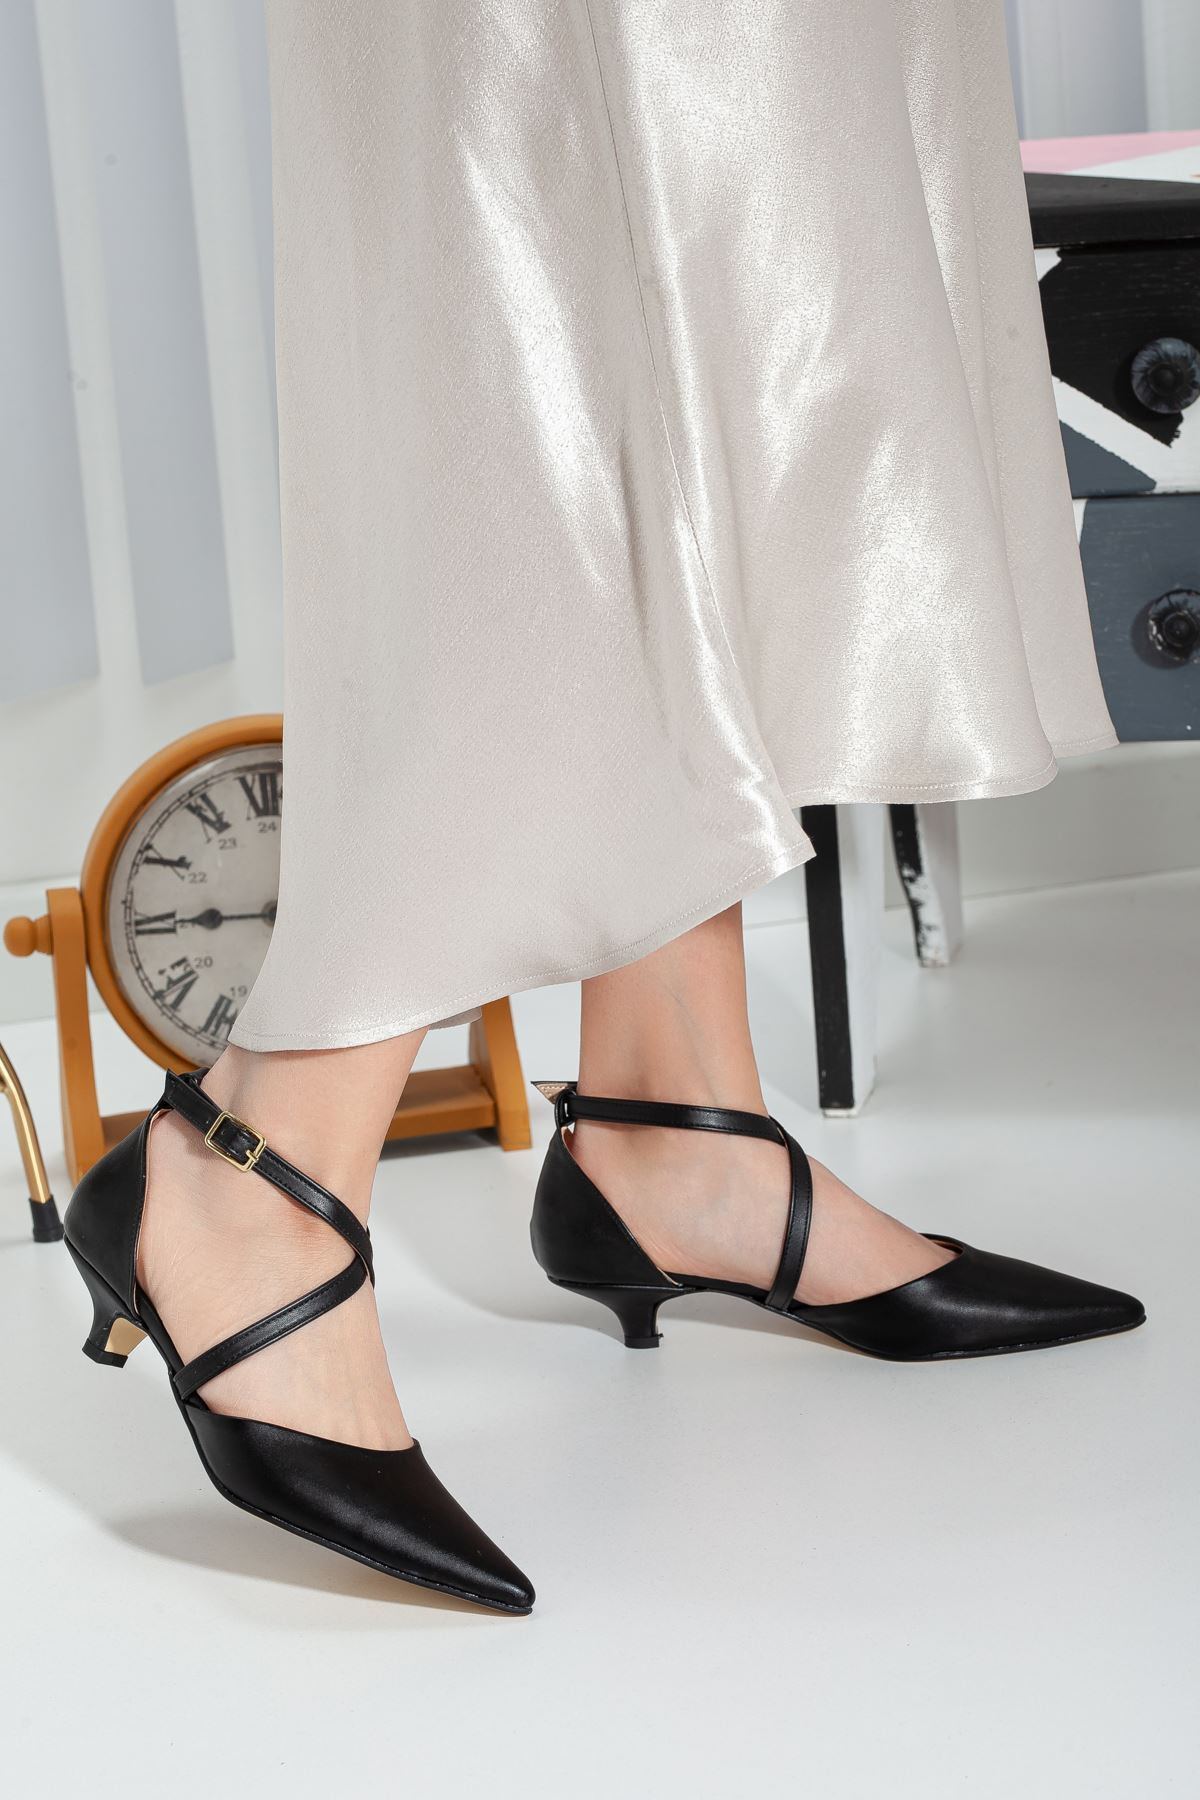 Balmi Kısa Topuklu Sivri Burun Ayakkabı SİYAH CİLT